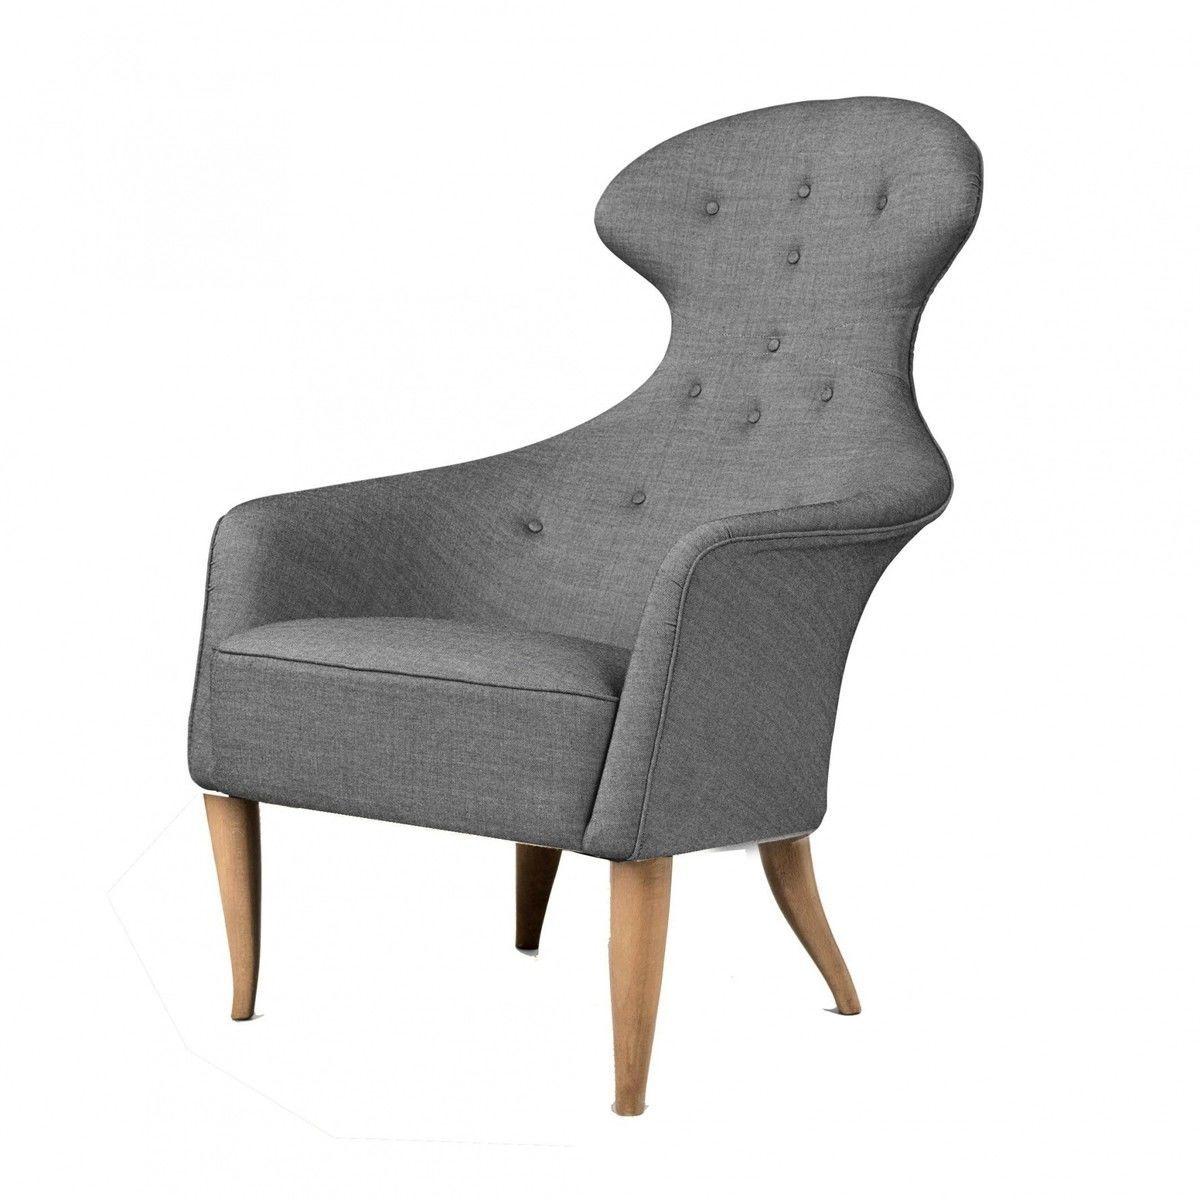 gubi eva lounge chair grey fabrics balder - Bergroer Sessel Und Ottomane